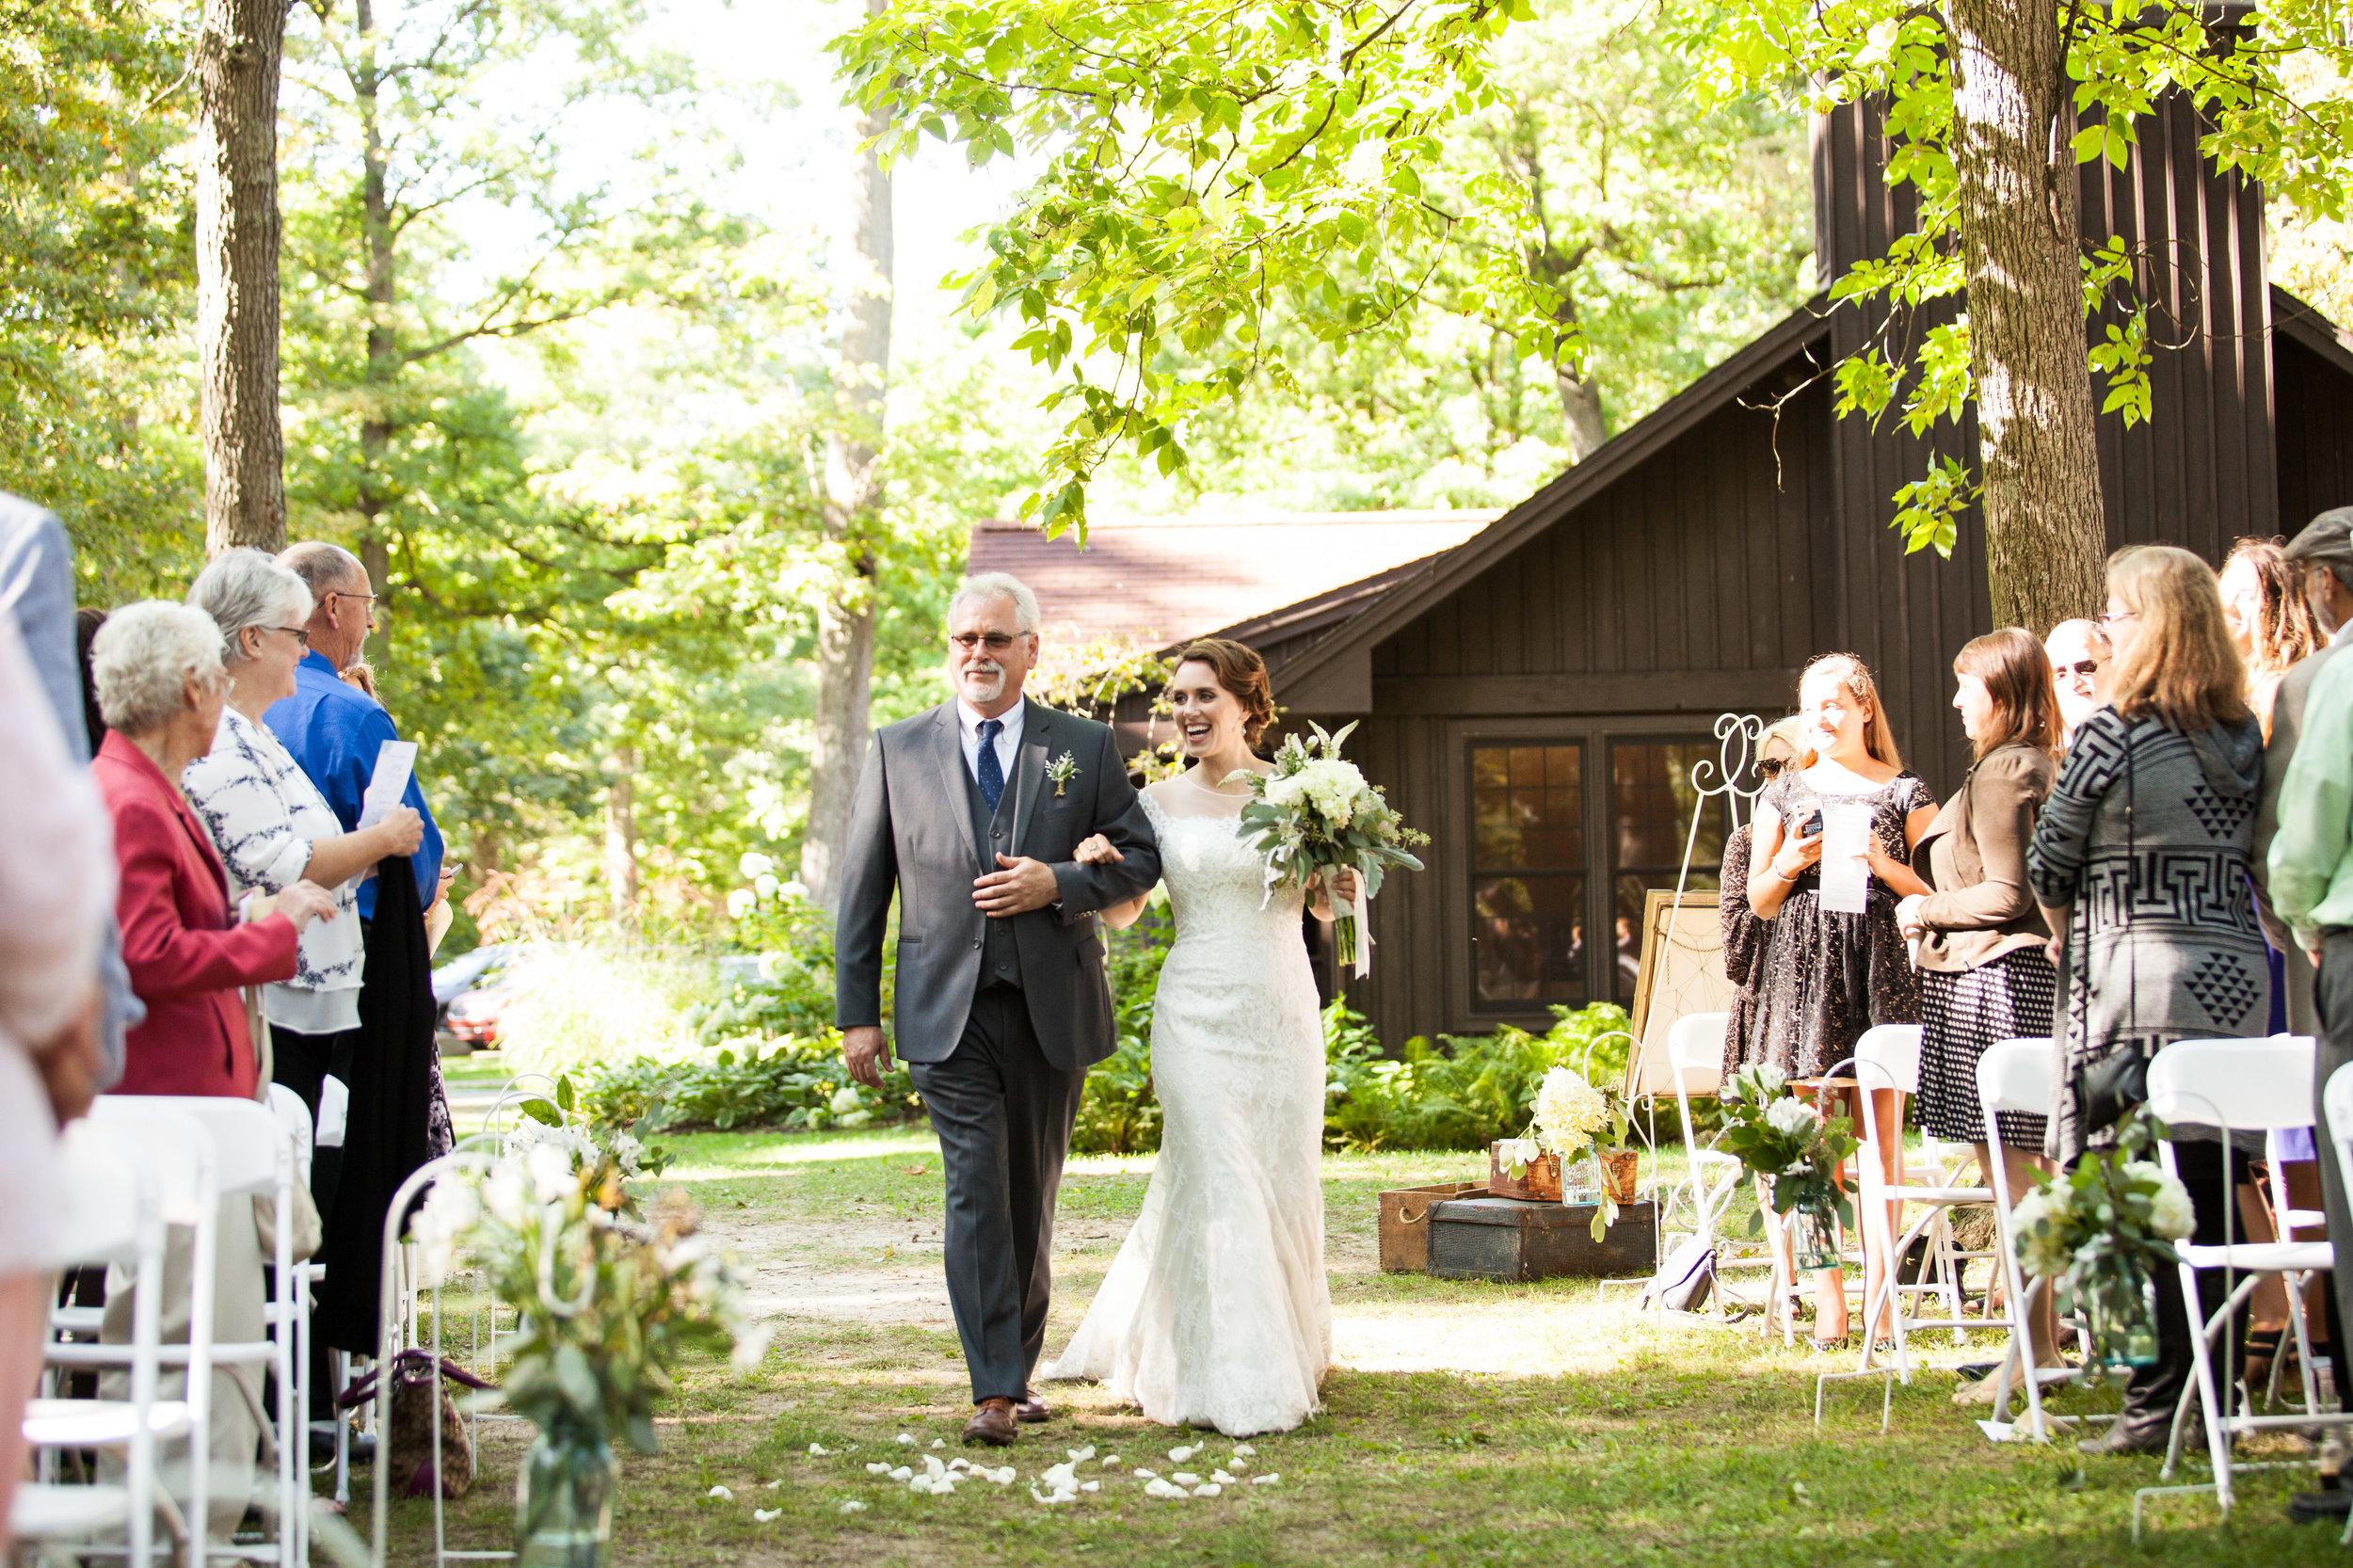 grand_rapids_wedding_rockford_wedding_richard_app_gallery_wedding_grand_rapids_wedding_photographer_summer_wedding_wabasis_lake_park_wedding_rustic_wedding-45.jpg